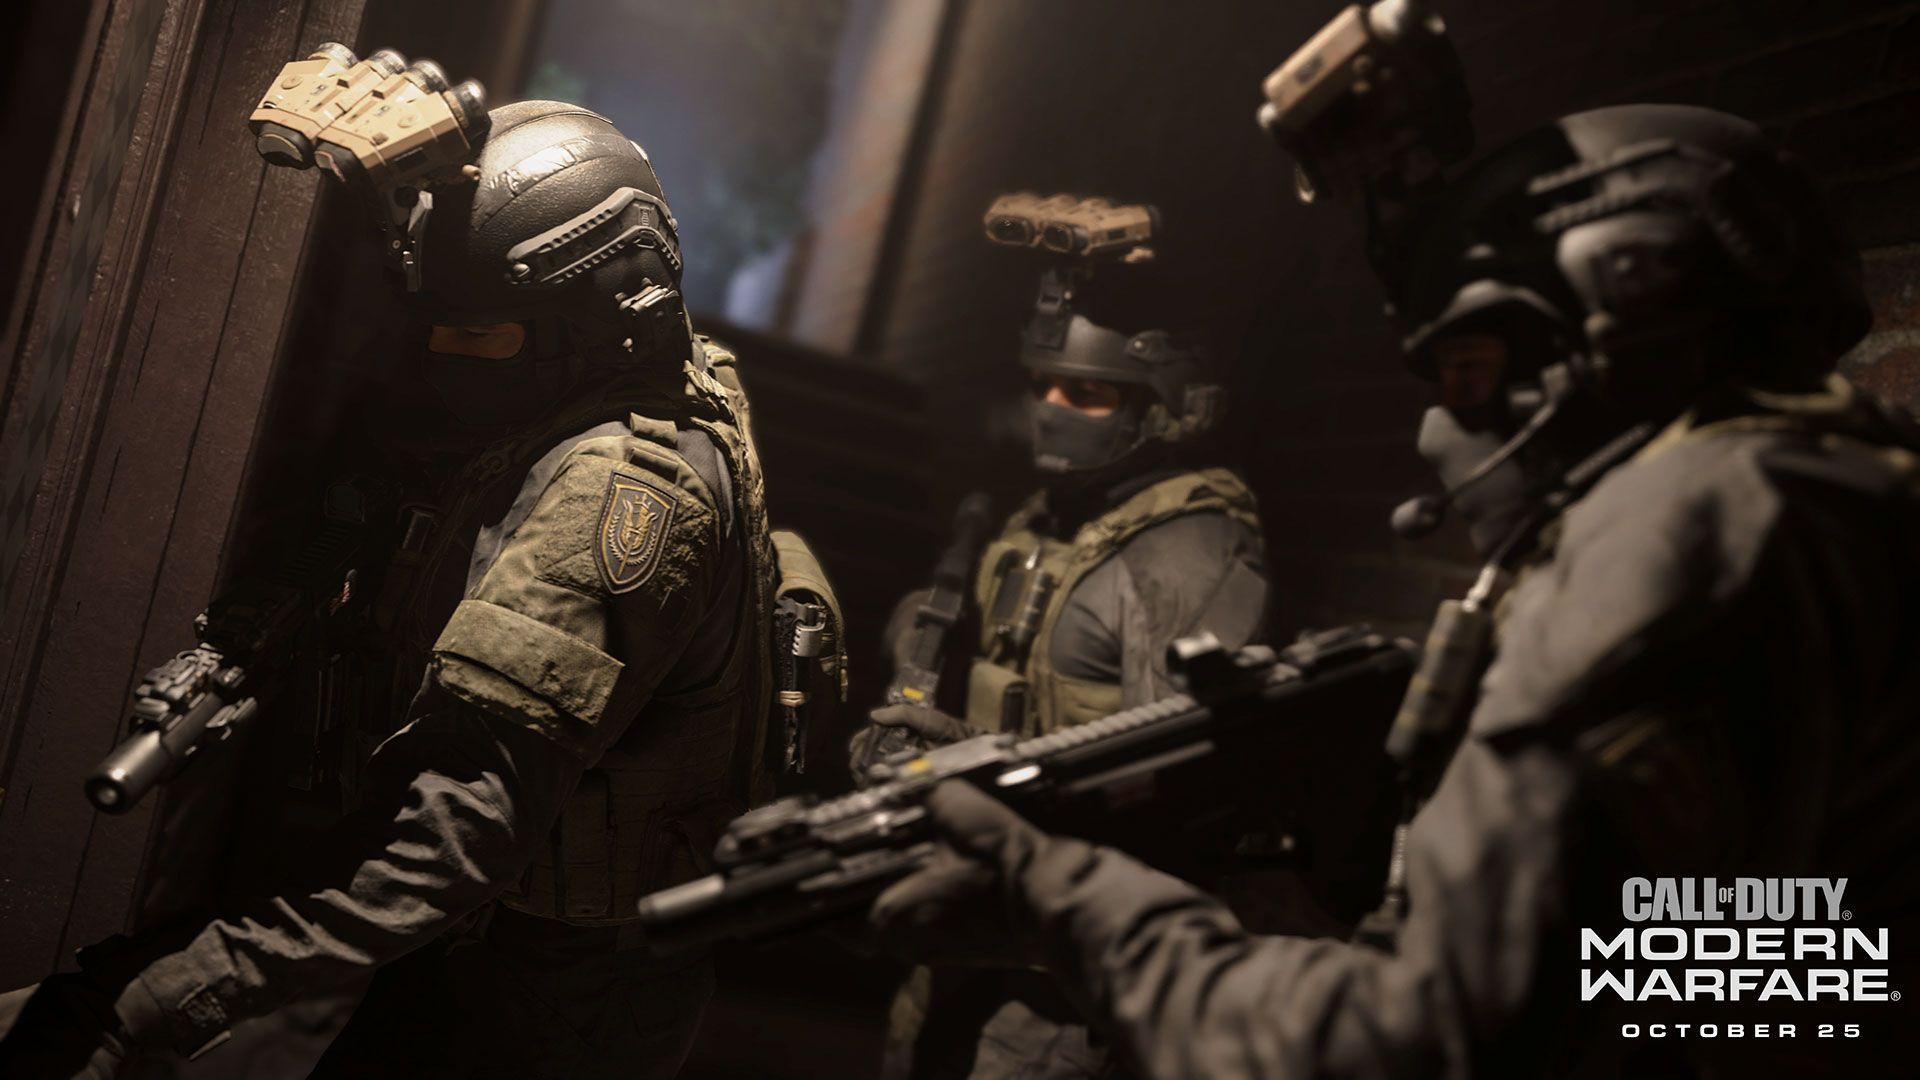 Download Call Of Duty Modern Warfare Hd Wallpapers 1080p